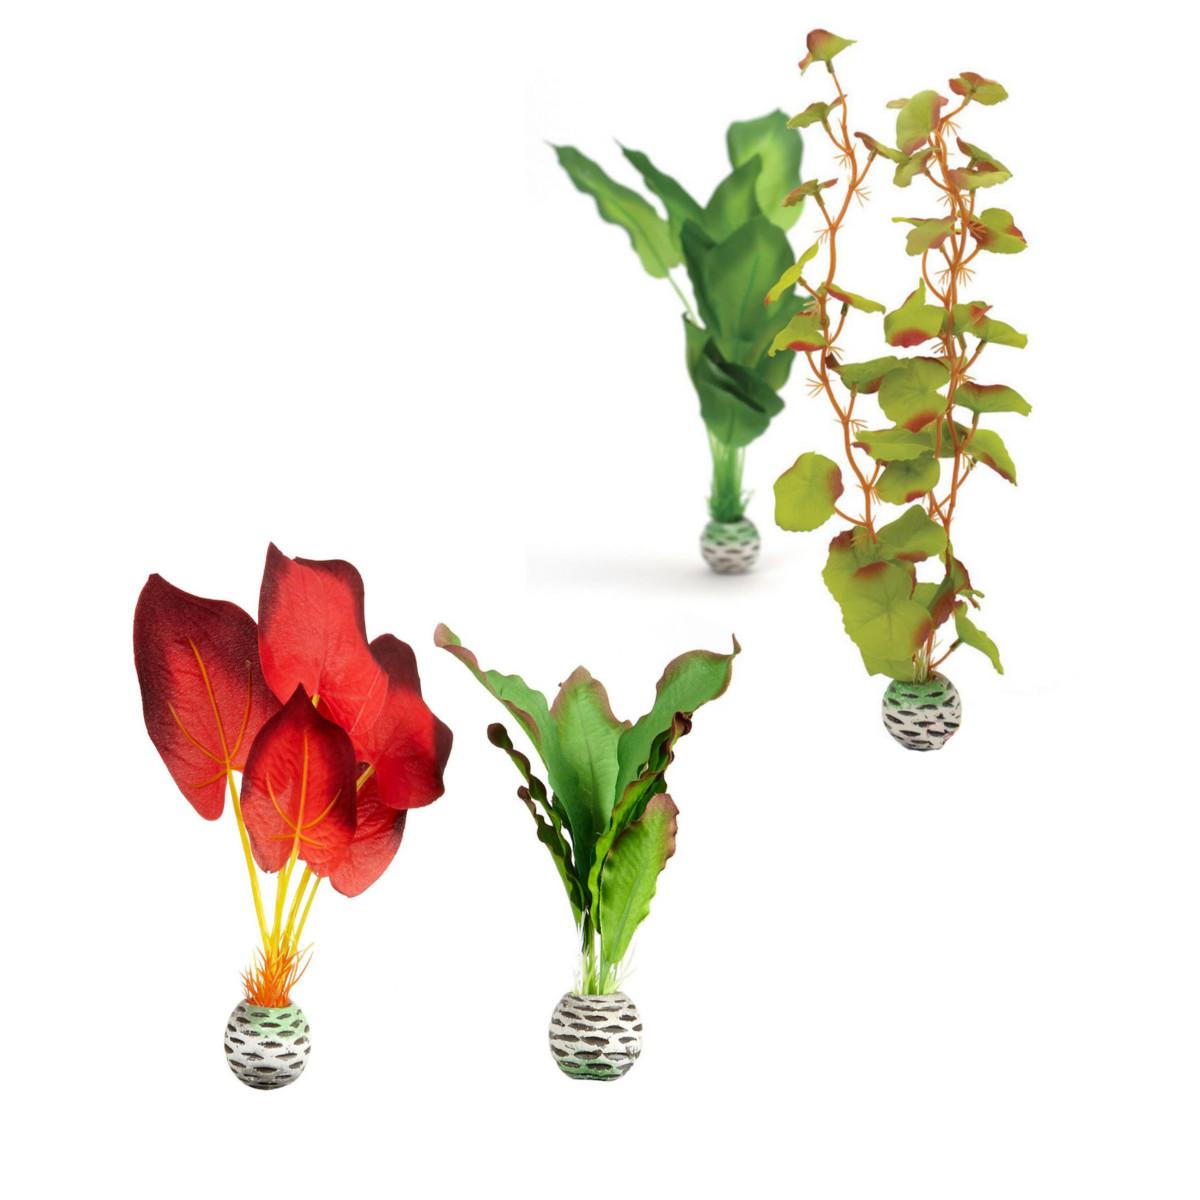 Biorb Aquarium Silk Collection Plants